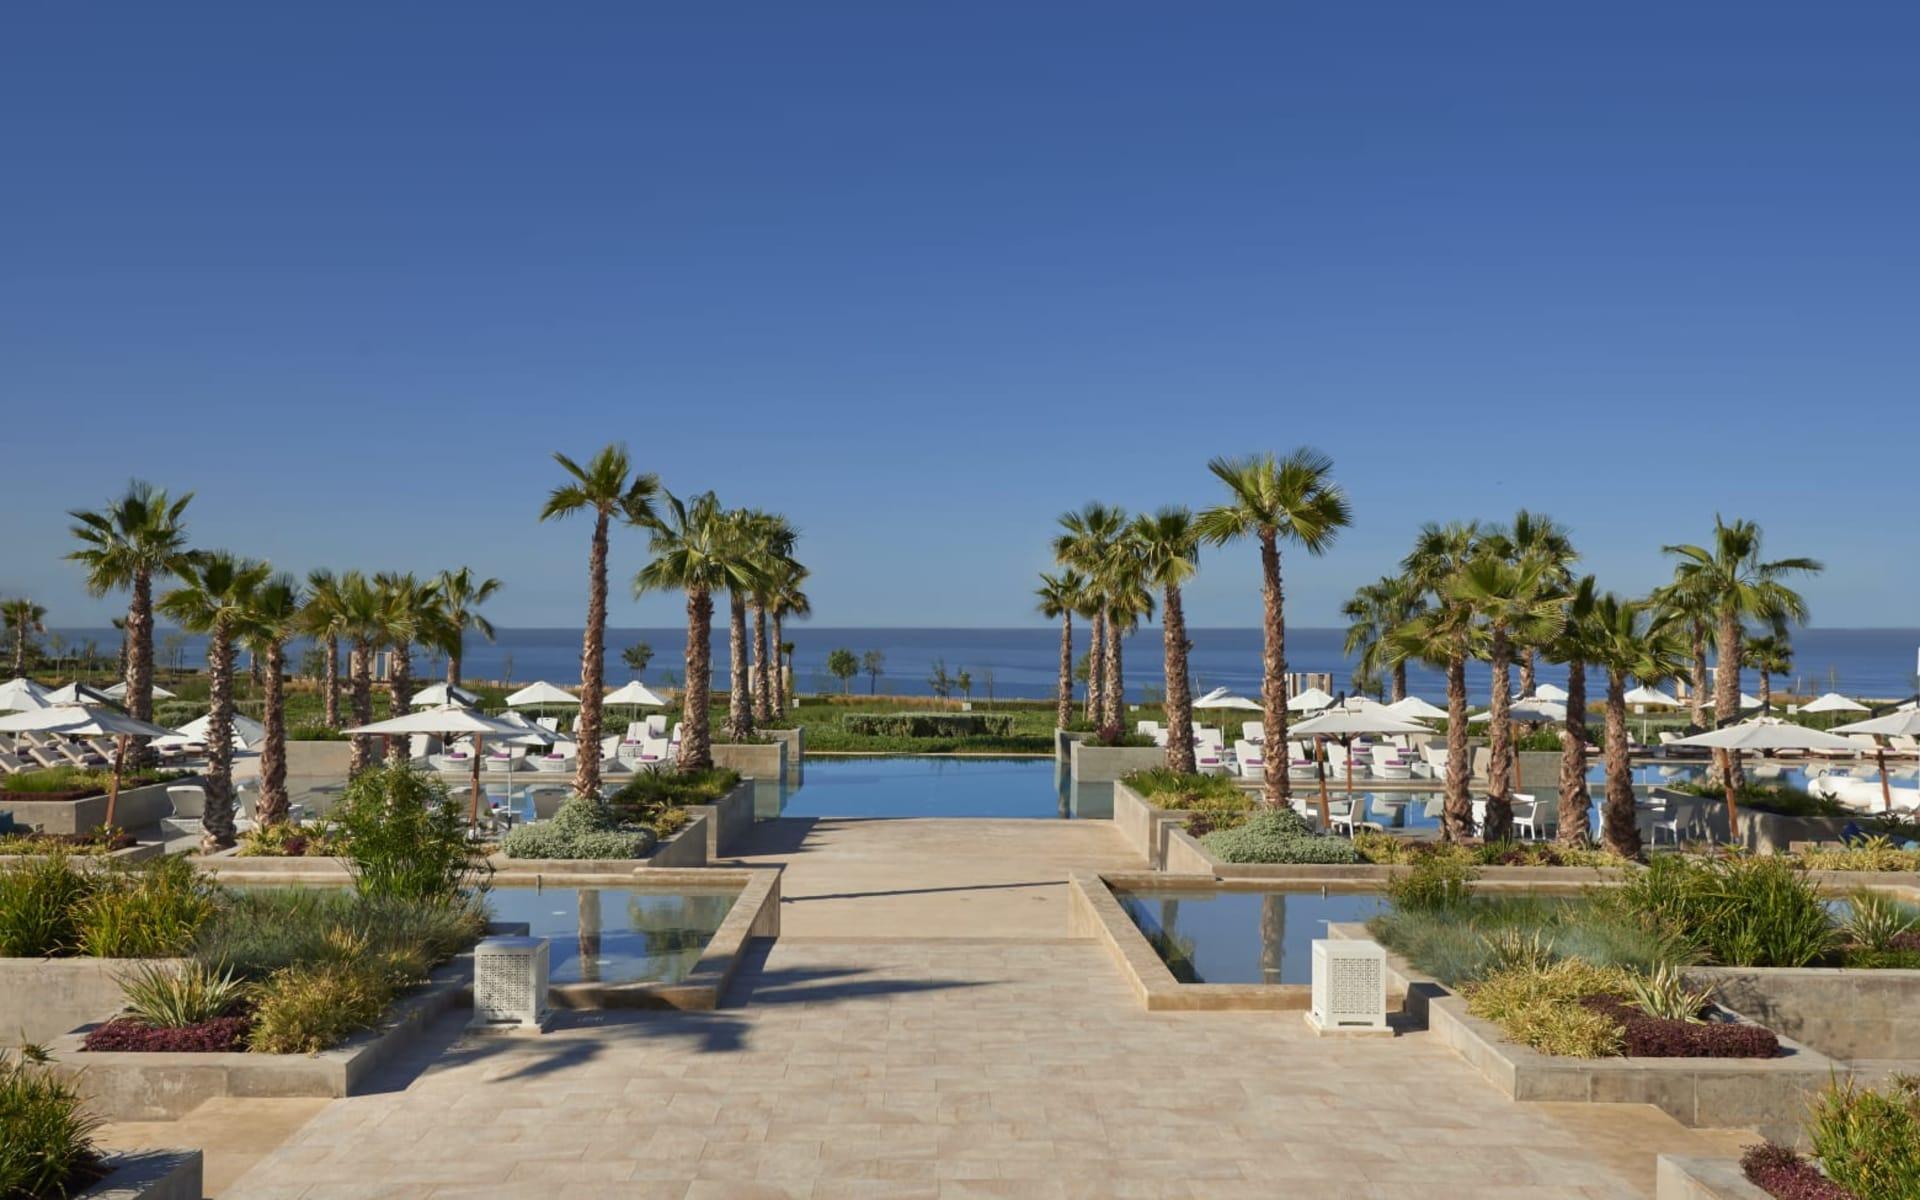 Hyatt Place Taghazout in Agadir:  Hyatt Place Taghazout - Blick über Pool zum Meer